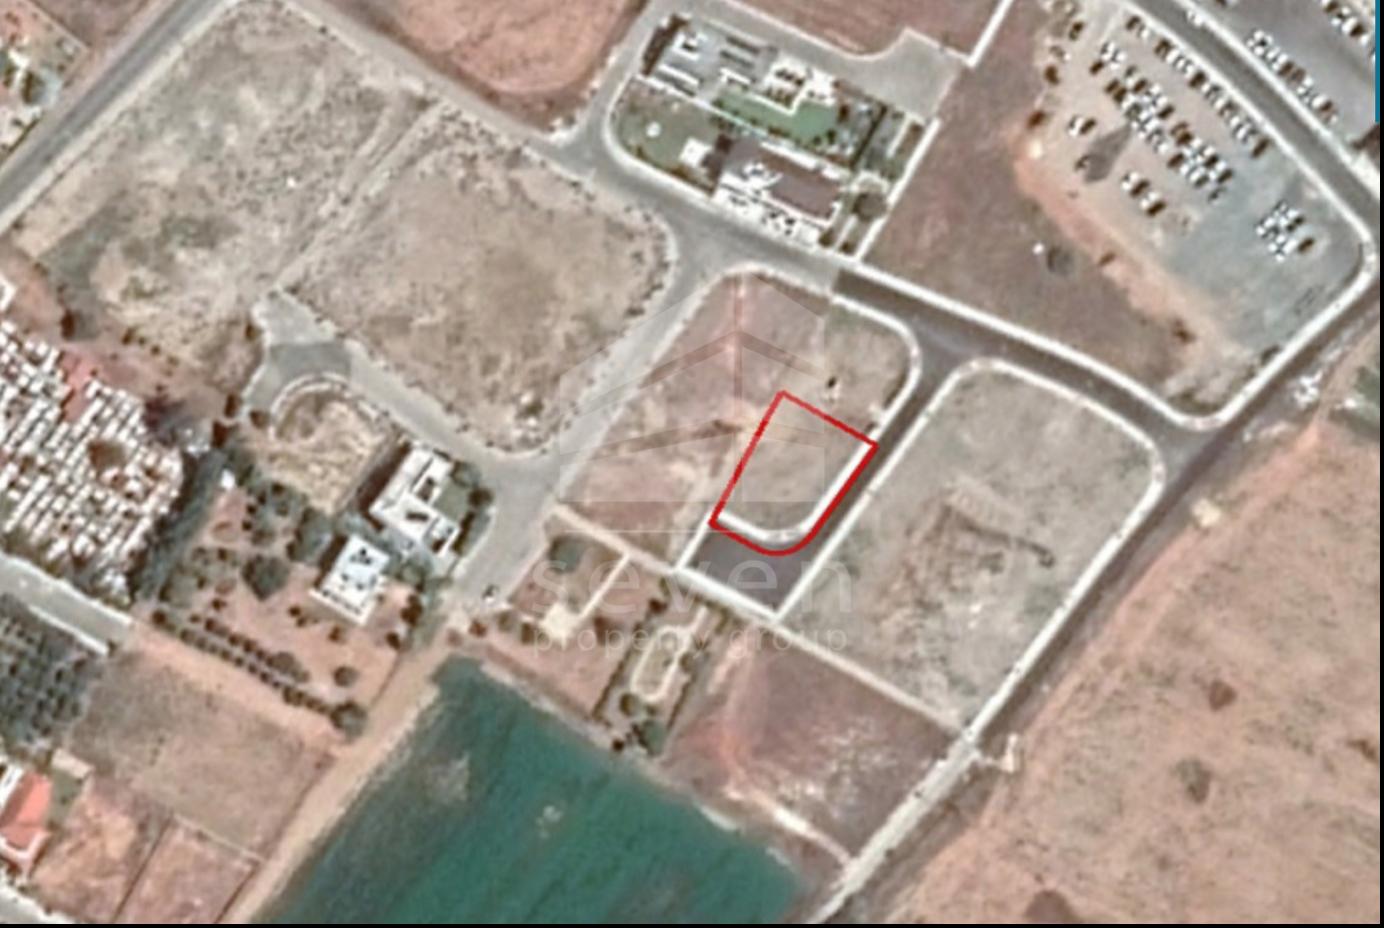 Residential Plot In Dromolaxia Area